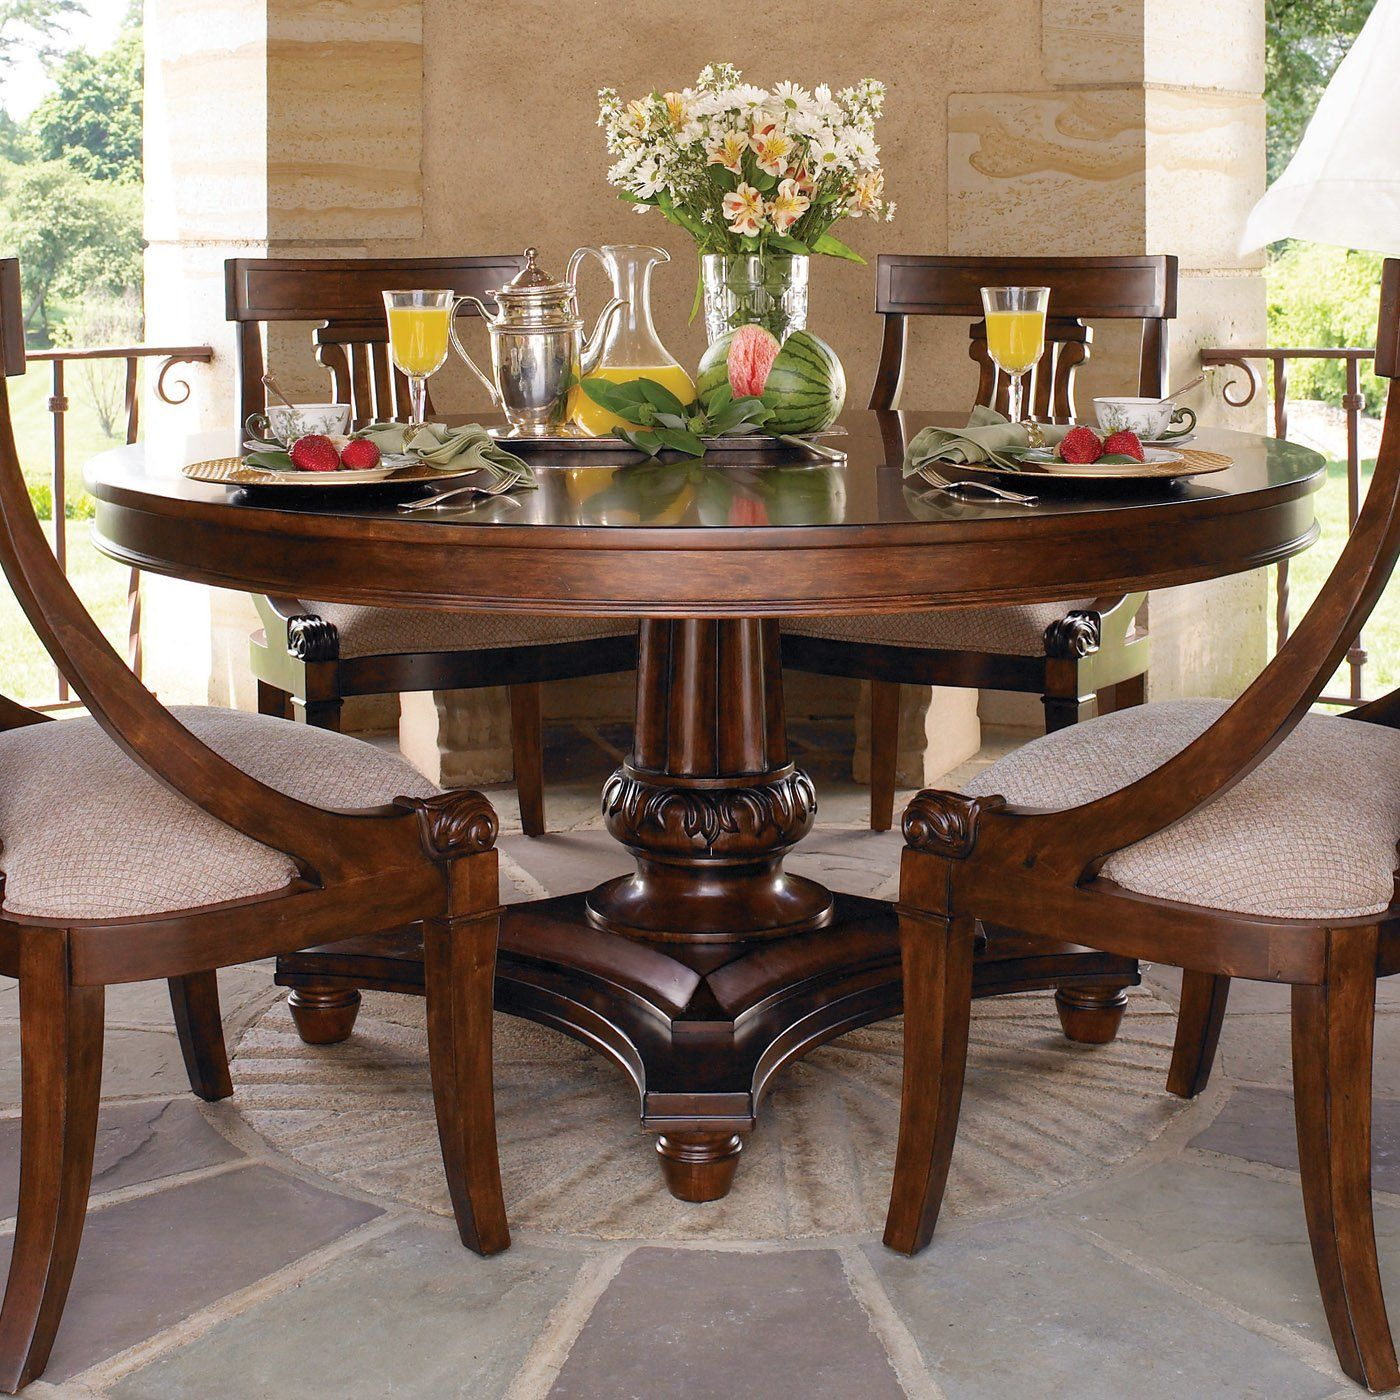 Kincaid Furniture Sturlyn Round Dining Table Round Dining Room Sets Dining Table Design Round Dining Table